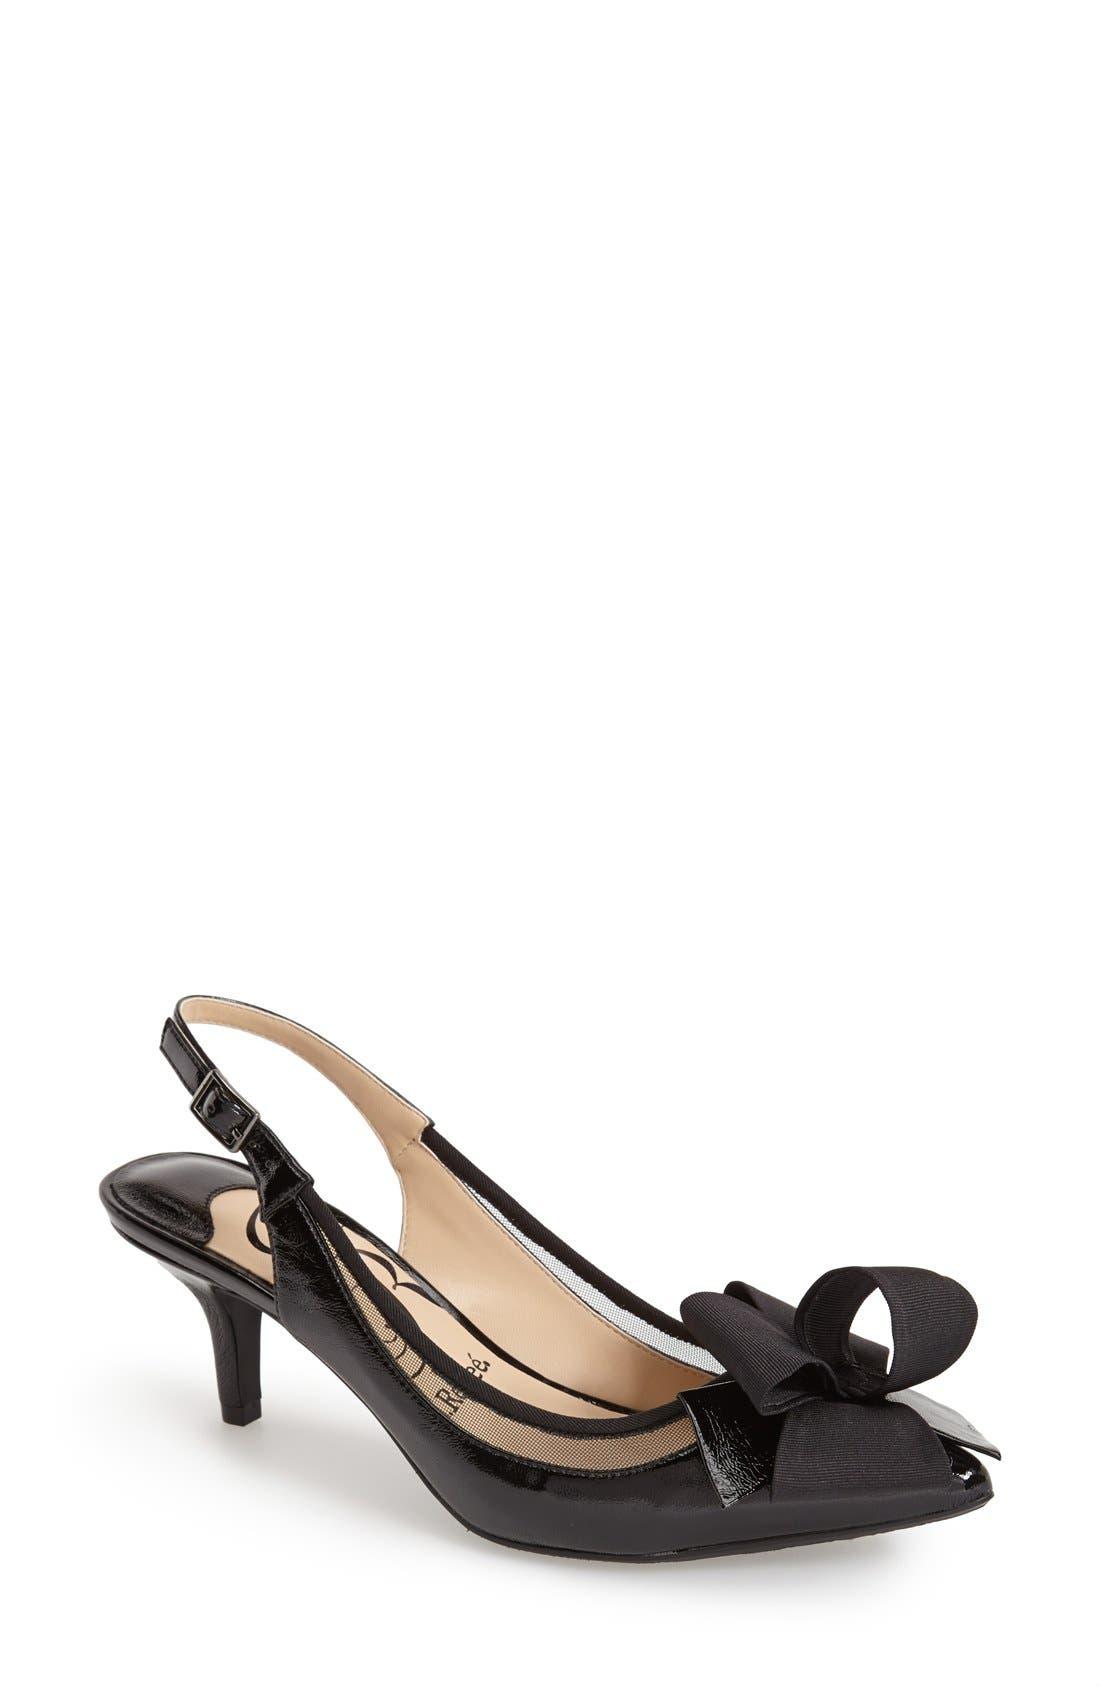 'Garbi' Pointy Toe Bow Pump,                         Main,                         color, Black/ Black